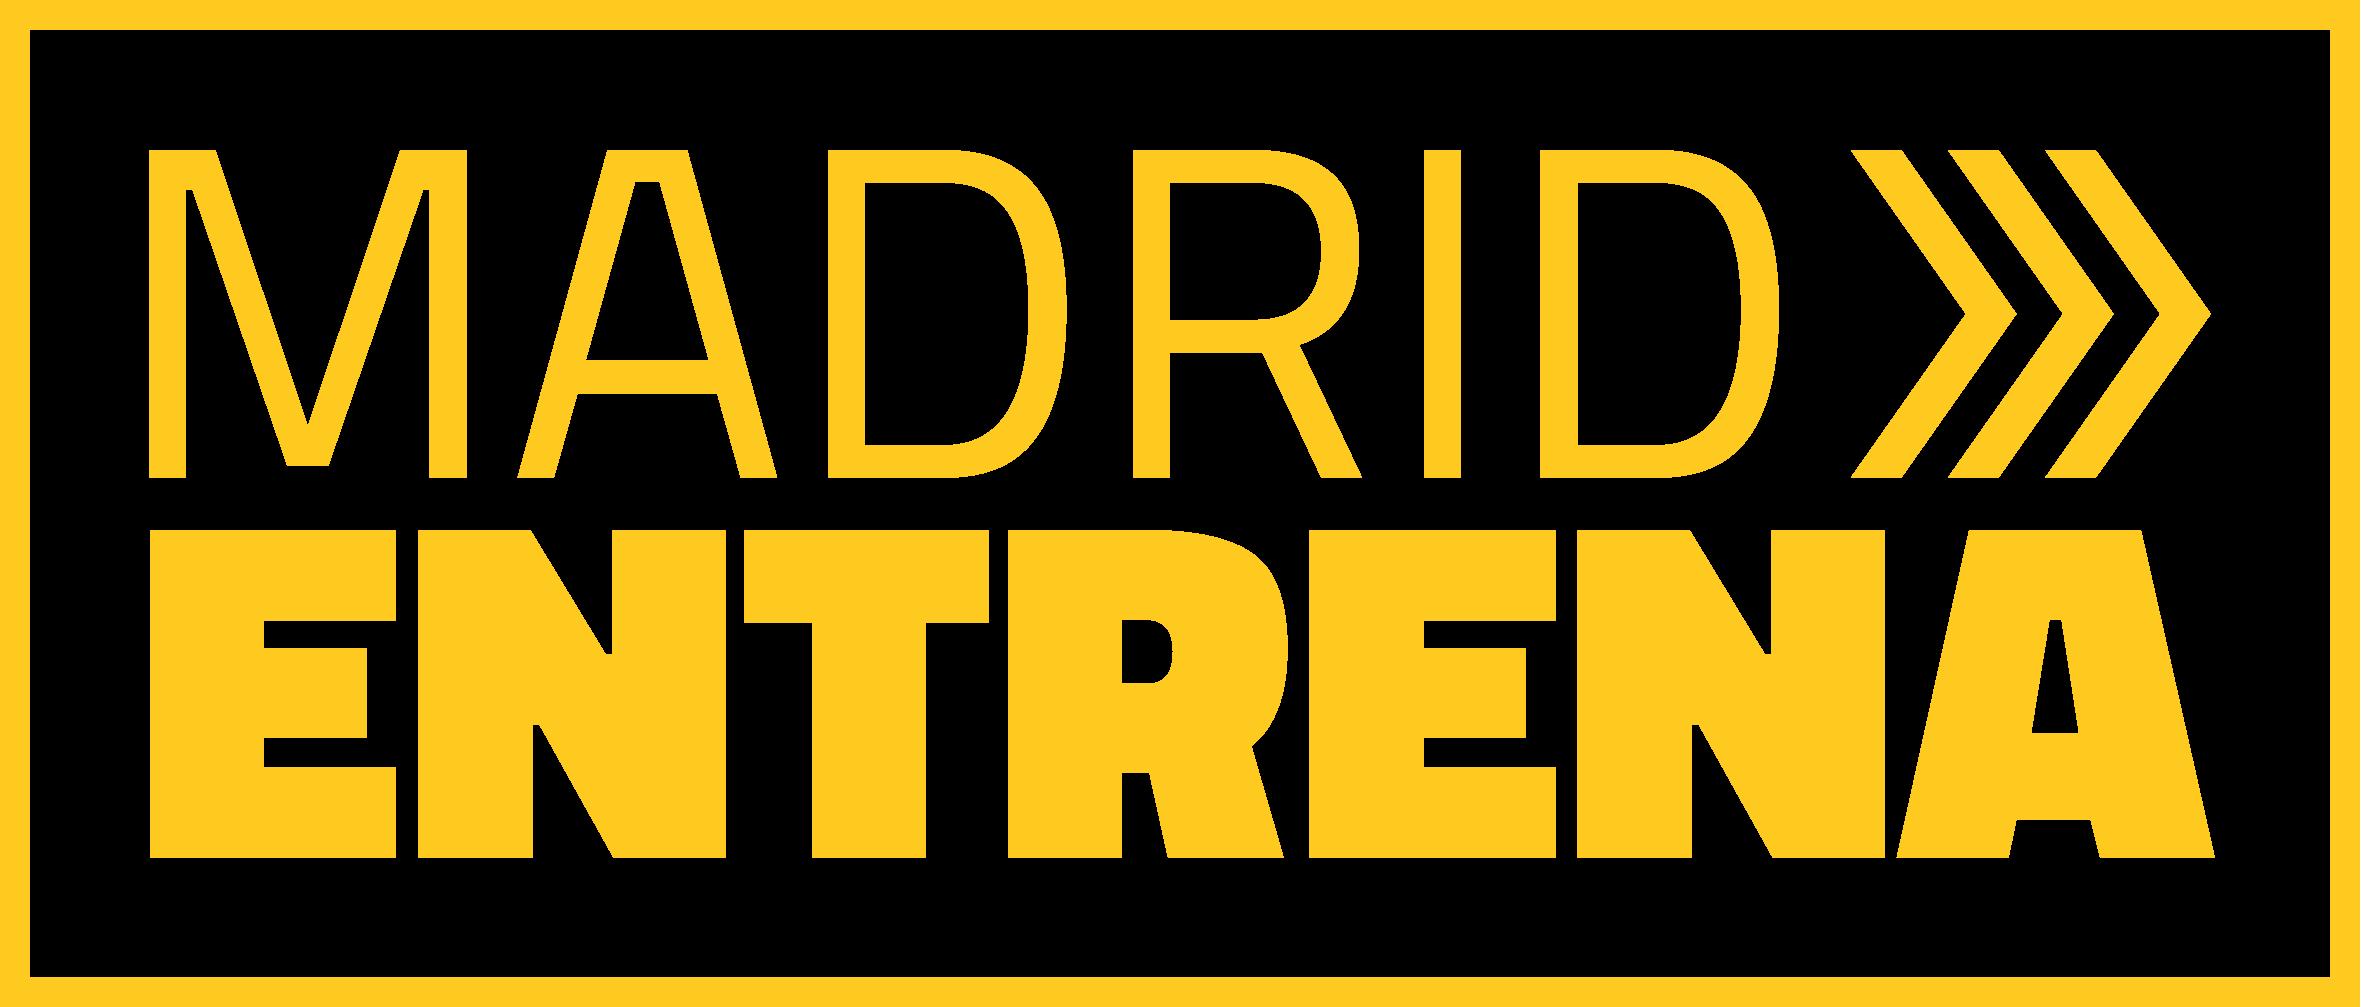 Madrid Entrena